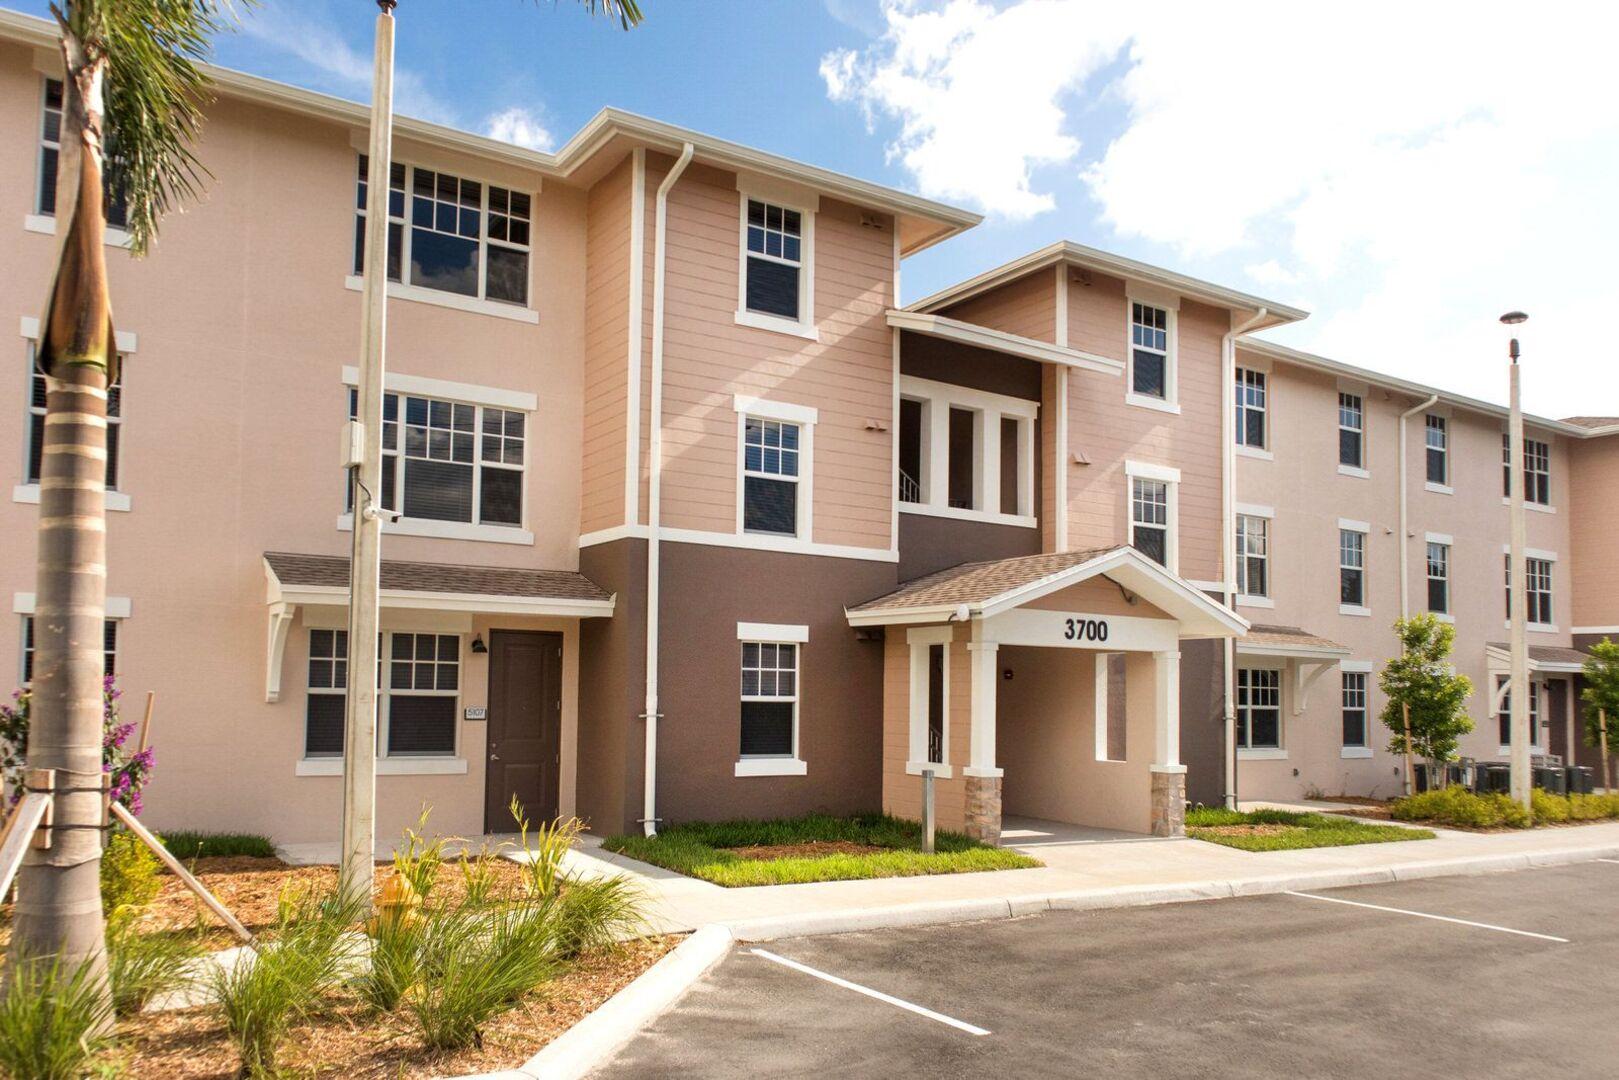 apartments for rent in oakland park fl oakland preserve home rh oaklandpreserve pmiflorida com